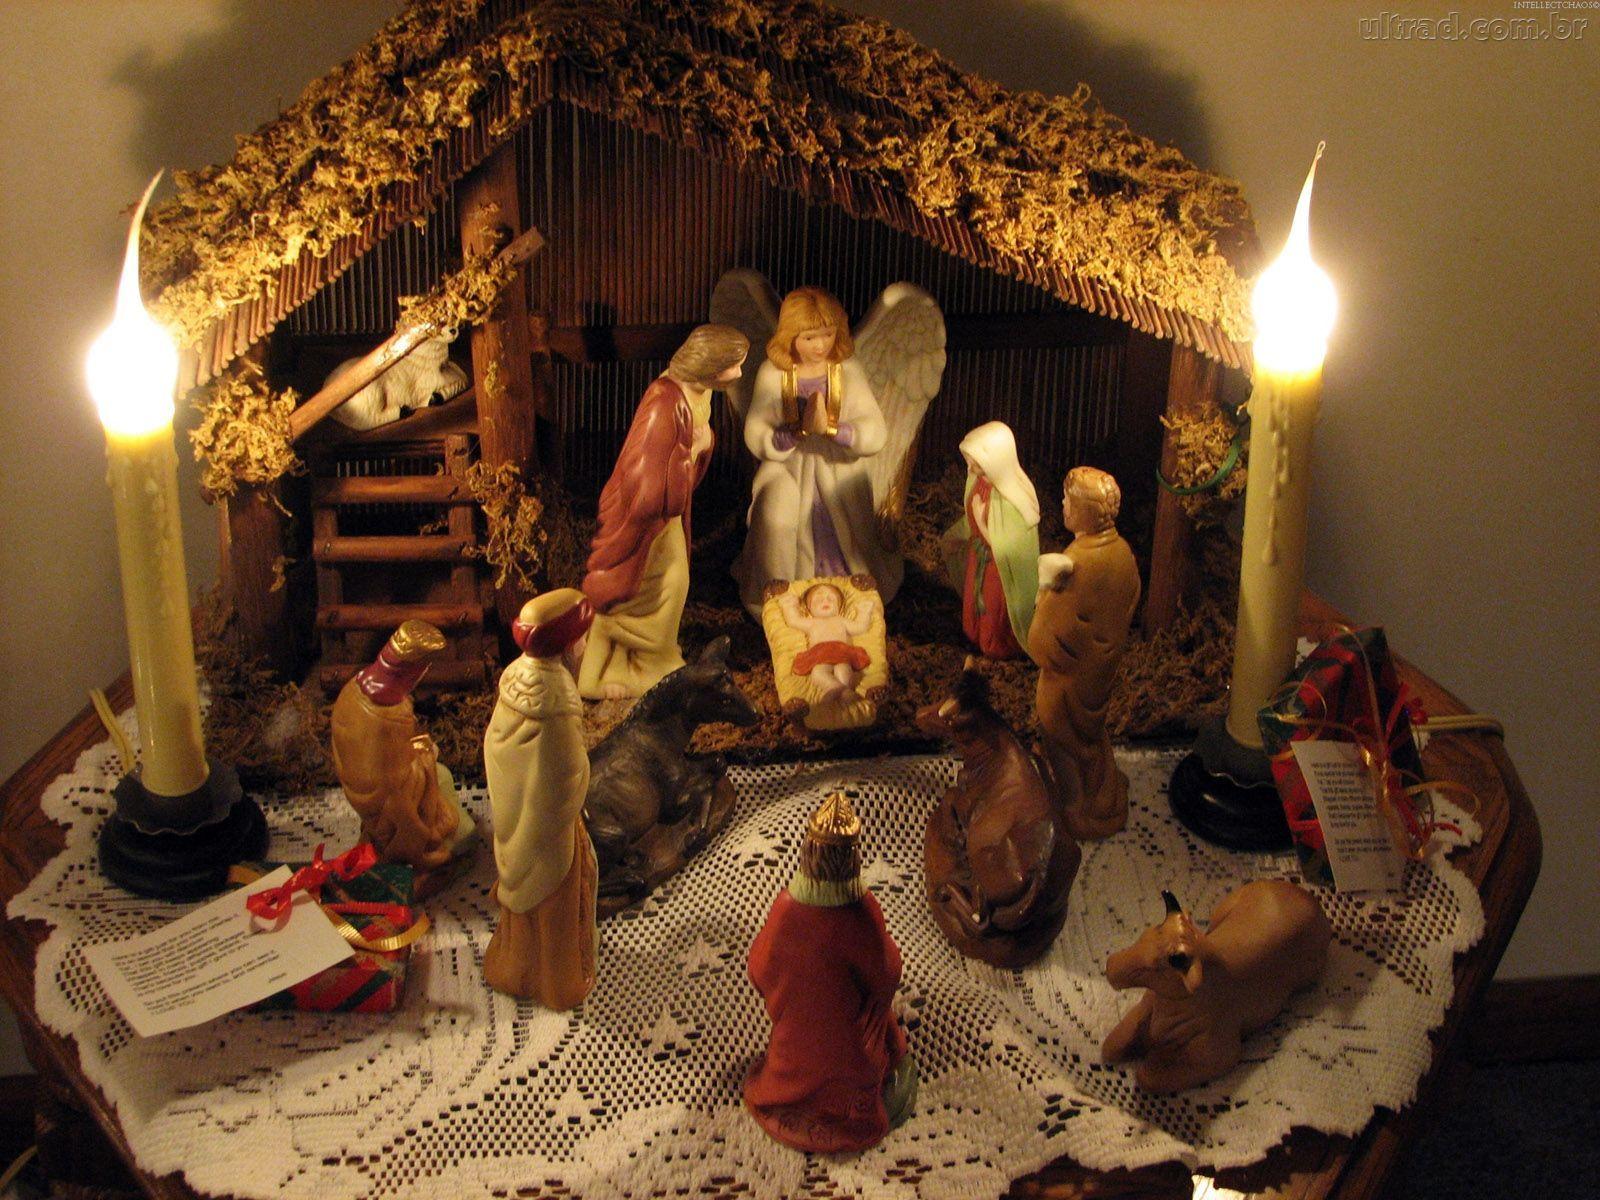 Christmas Celebrating Jesus Birth Wallpapers Hd Wallpapers Christmas Wallpaper Free Animated Christmas Wallpaper Christmas Wallpaper